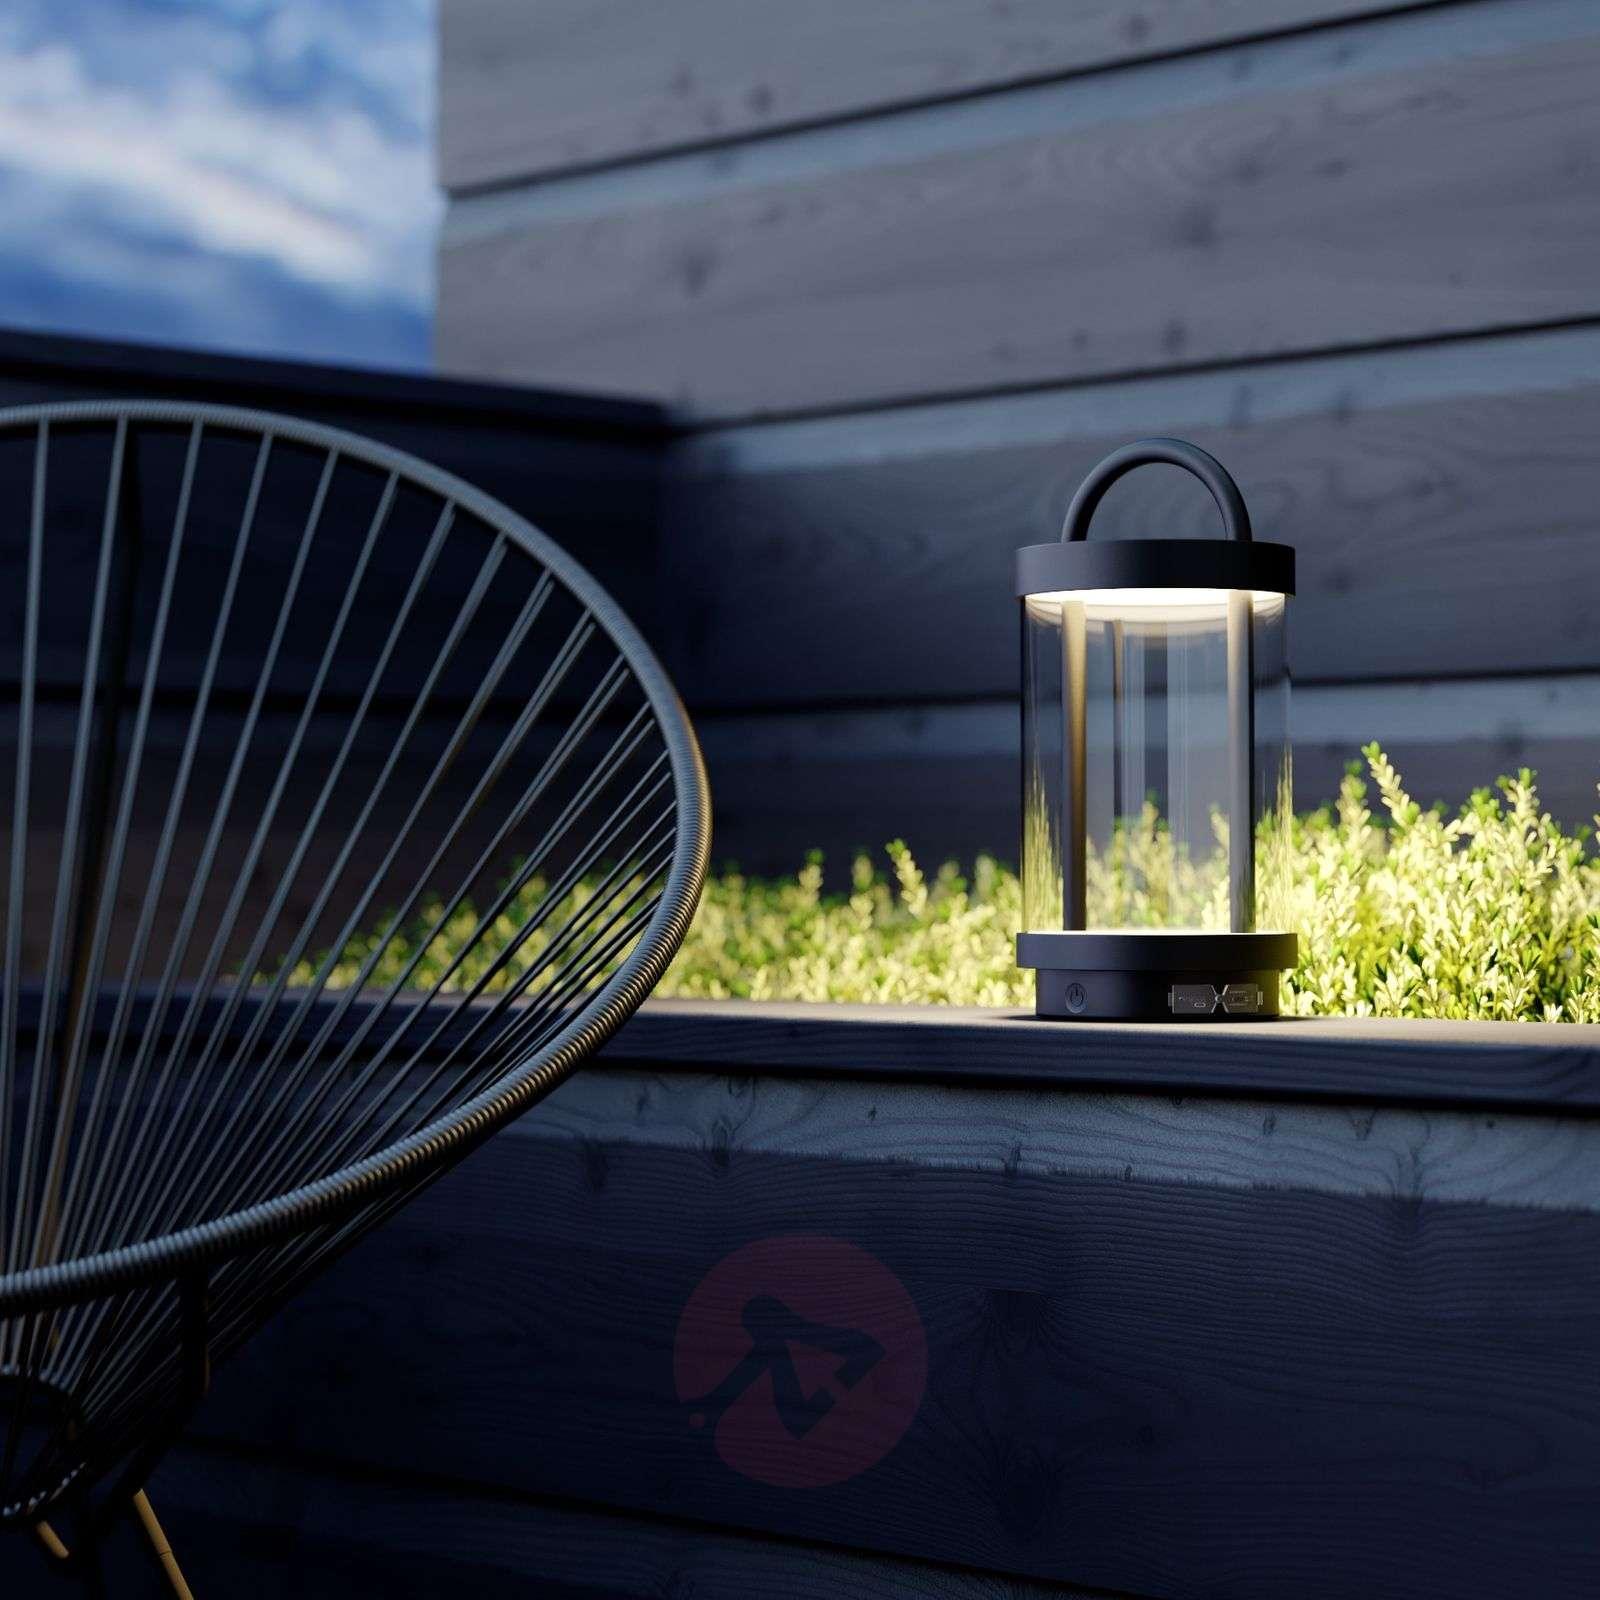 Lucande Caius LED-koristevalaisin ulkokäyttöön-9619167-02